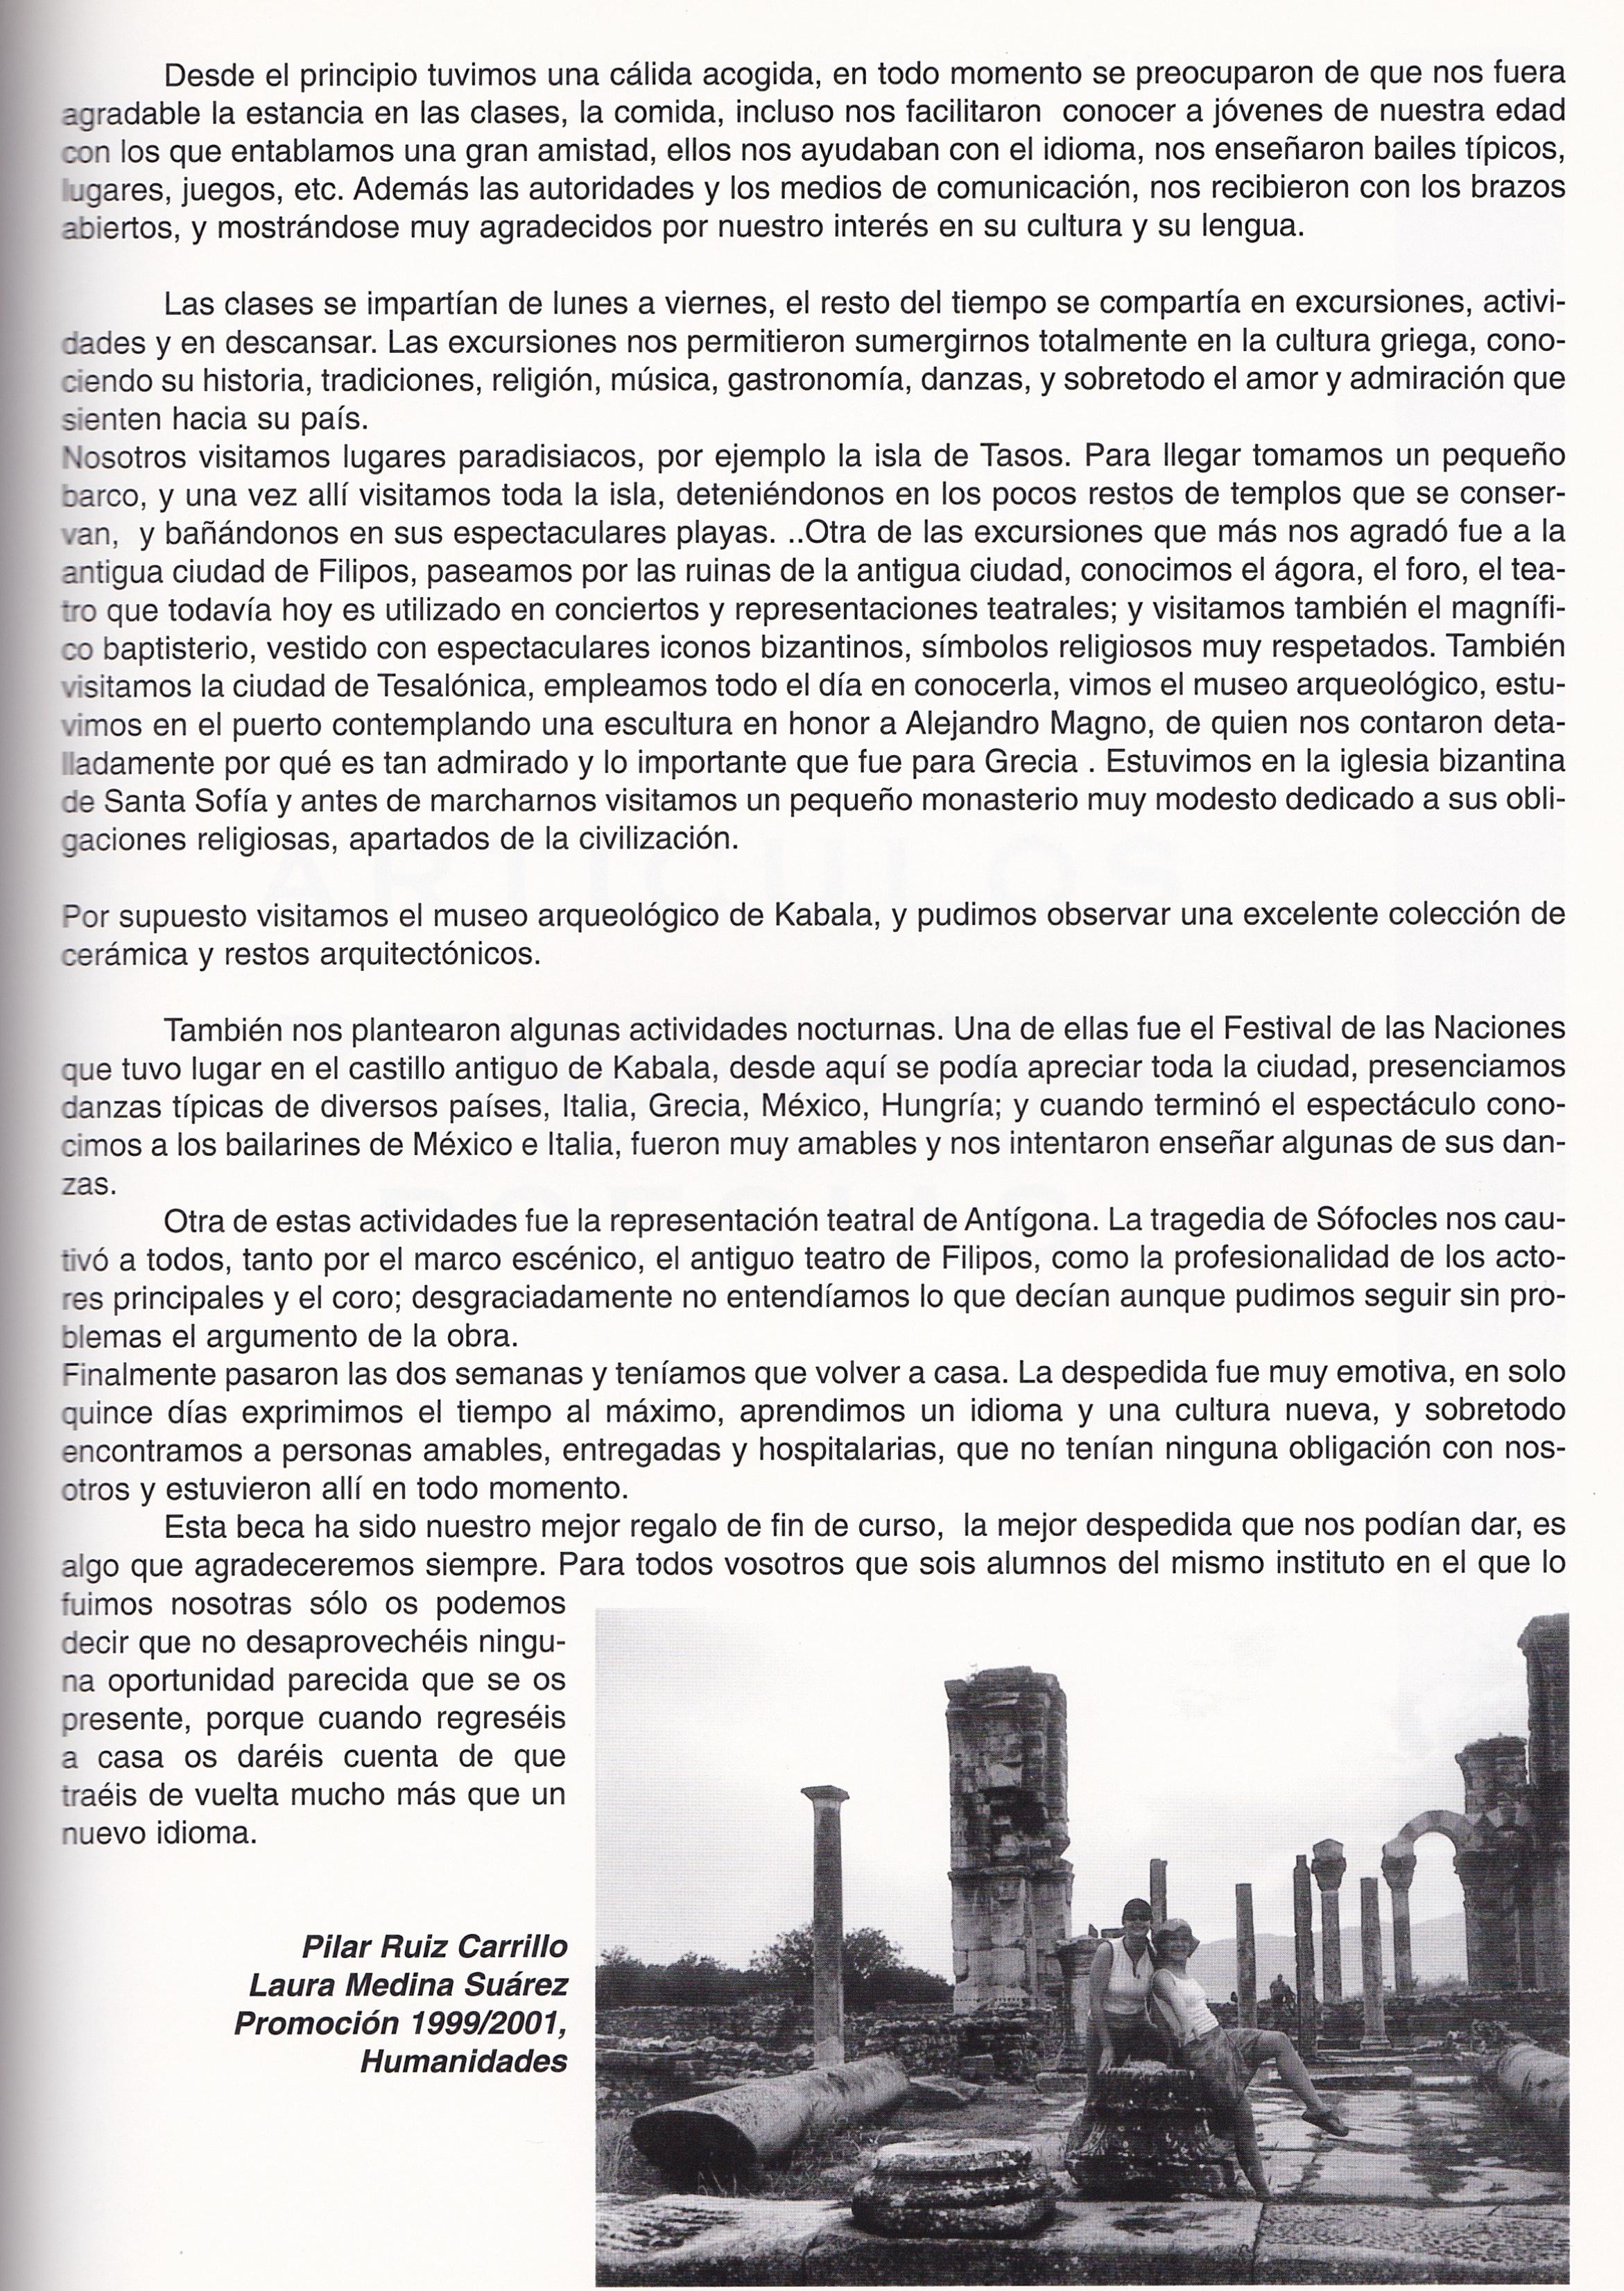 latingriego2